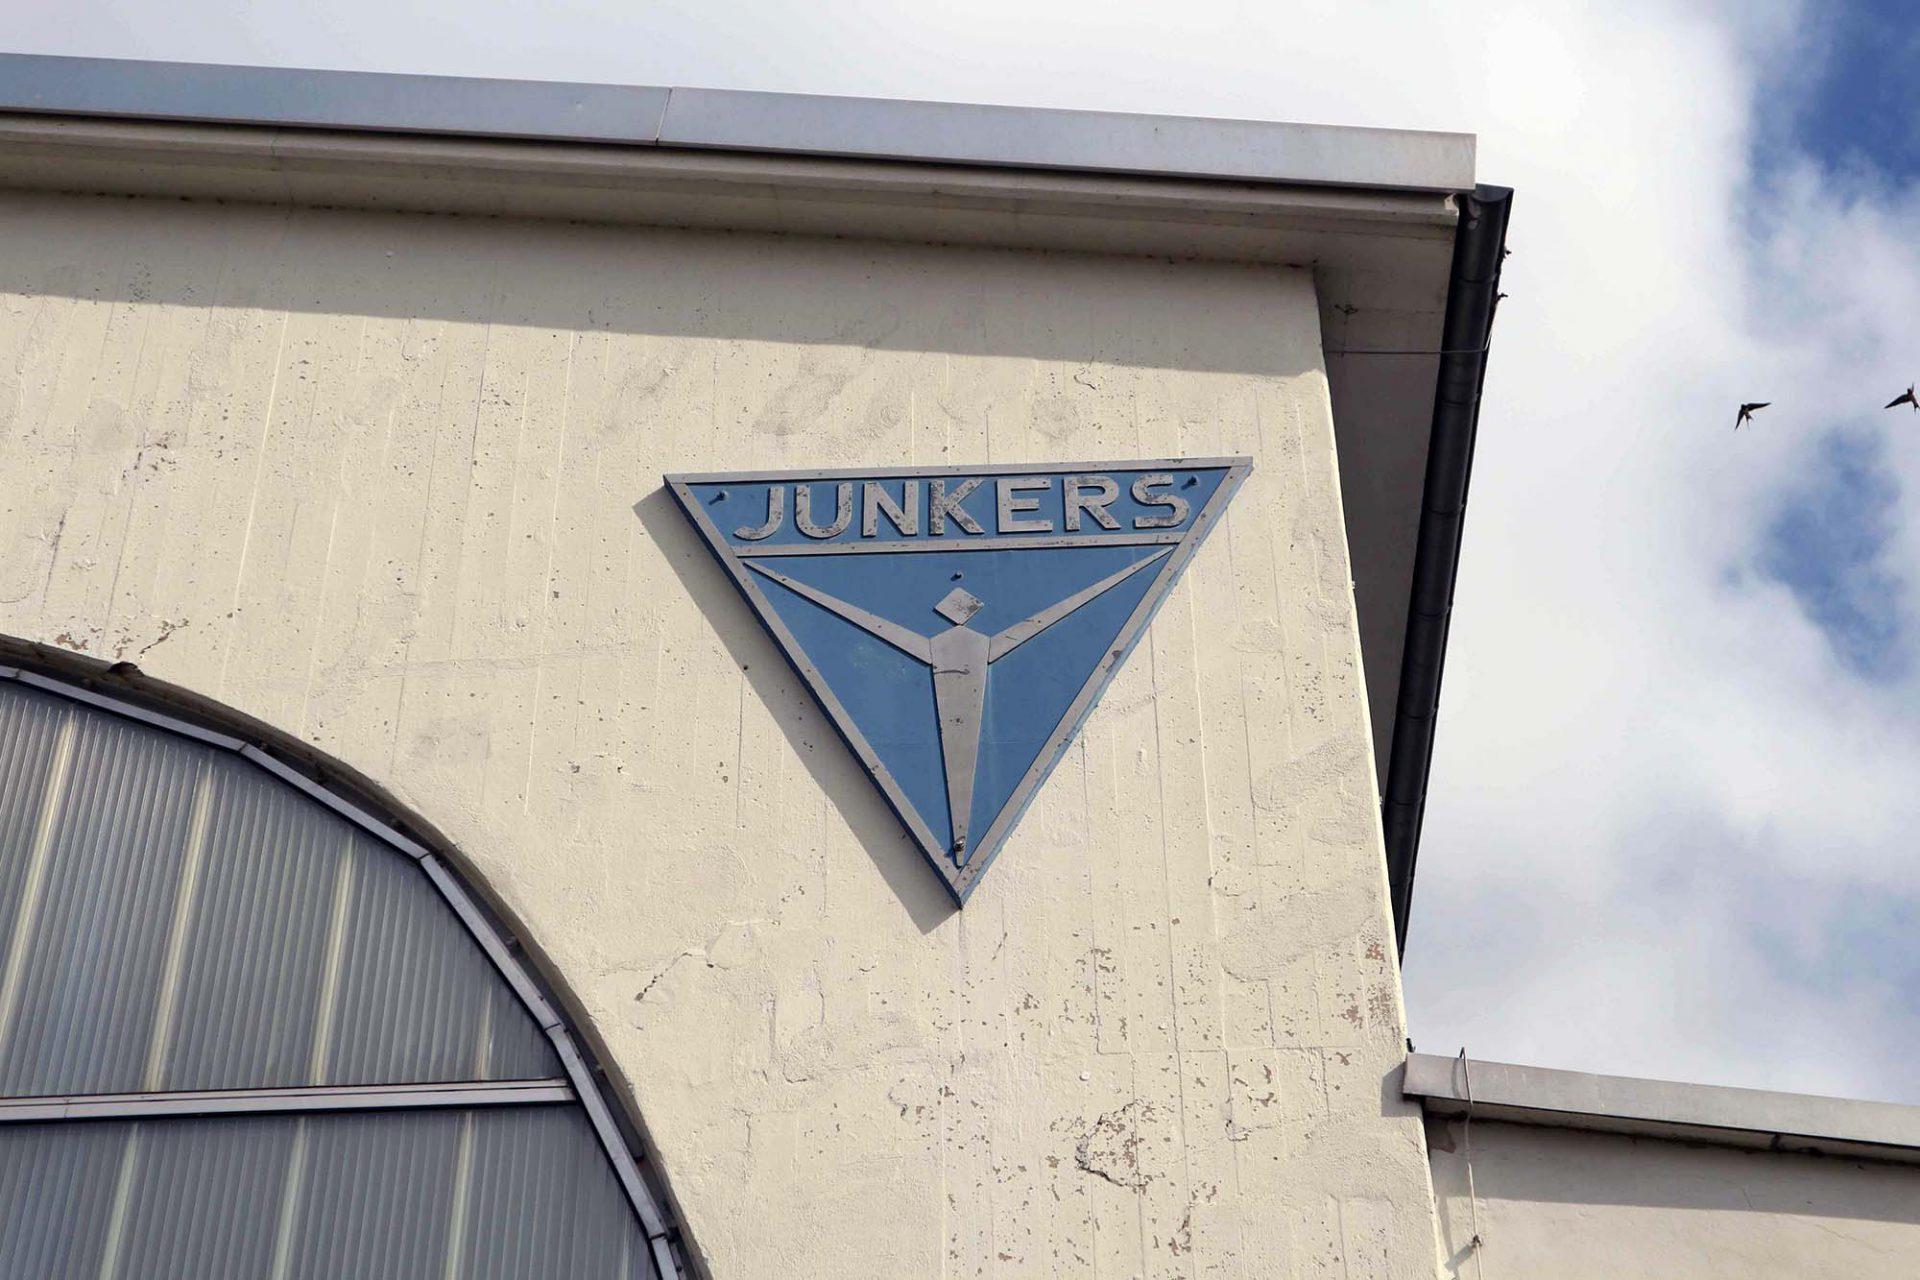 Junkers.